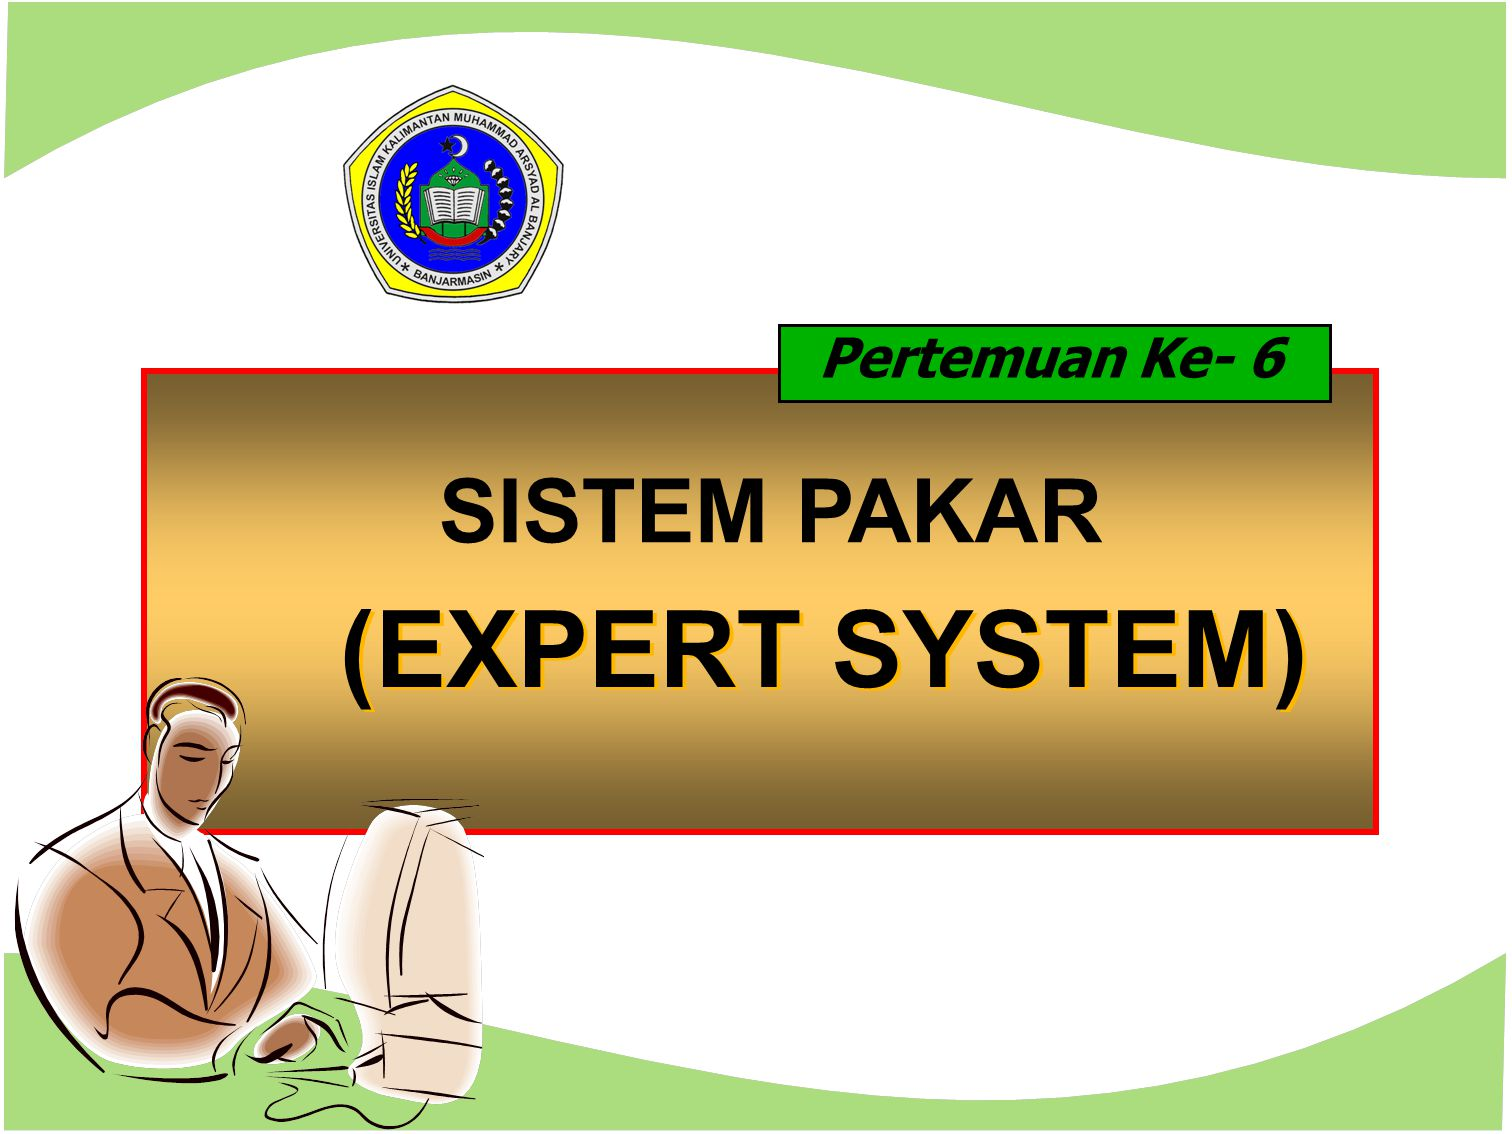 KNOWLEDGE ENGINEERING Proses pengembangan suatu sistem pakar Orang yang mengembangkan suatu sistem pakar disebut: Knowledge Engineer Fase pengembangan sistem pakar 1.